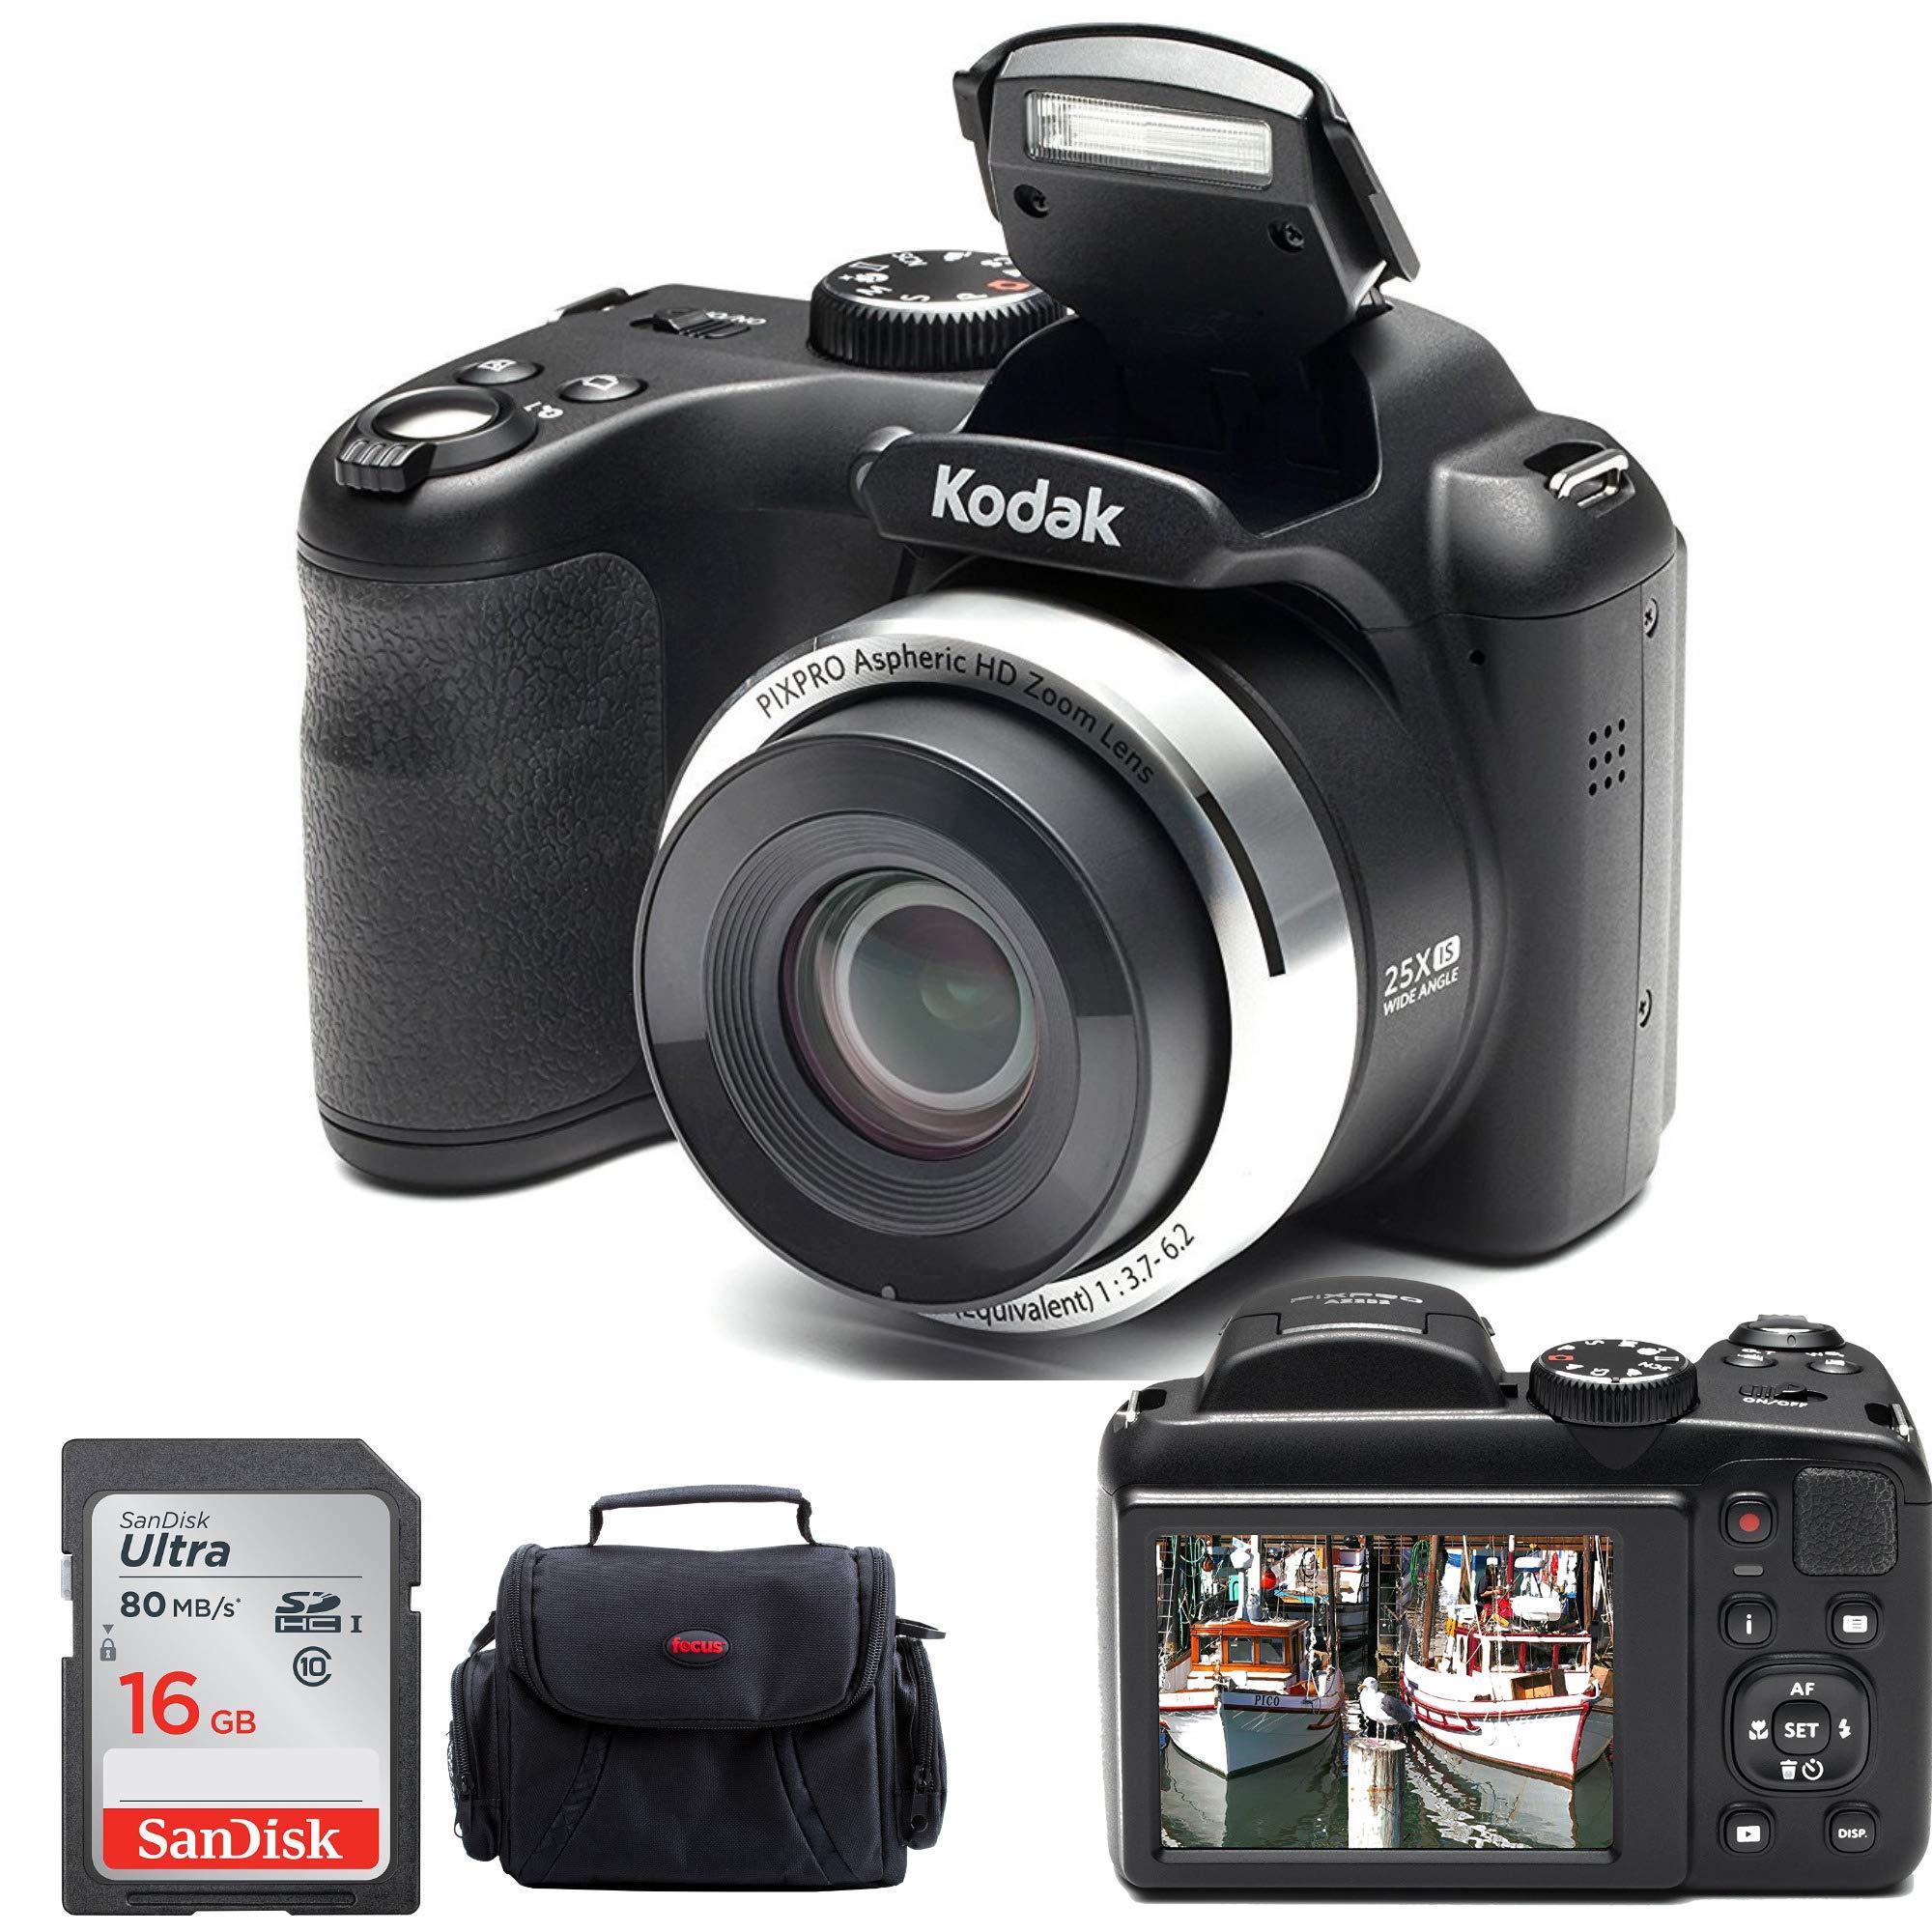 Kodak PIXPRO AZ252 Point & Shoot Digital Camera with 3'' LCD (Black) and 16GB SD Card and Case